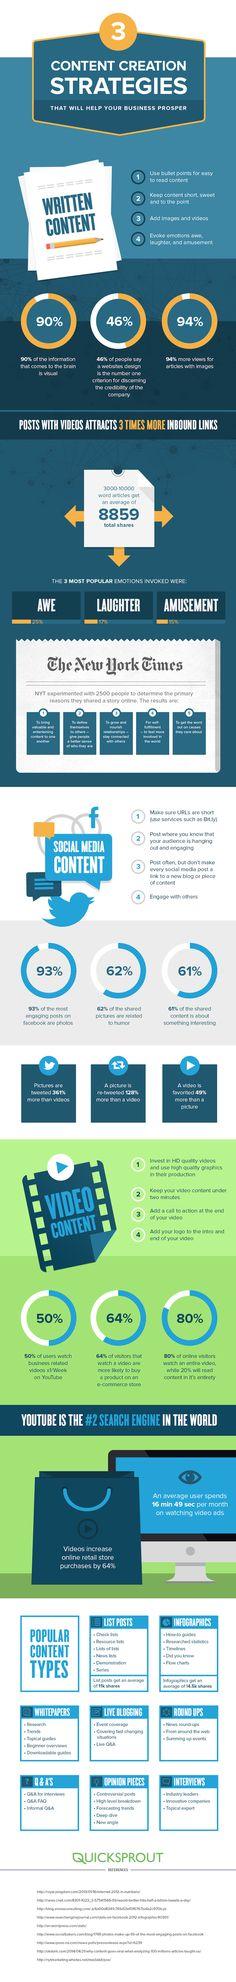 Hoe genereer je de juiste content? #socialmedia #nederland